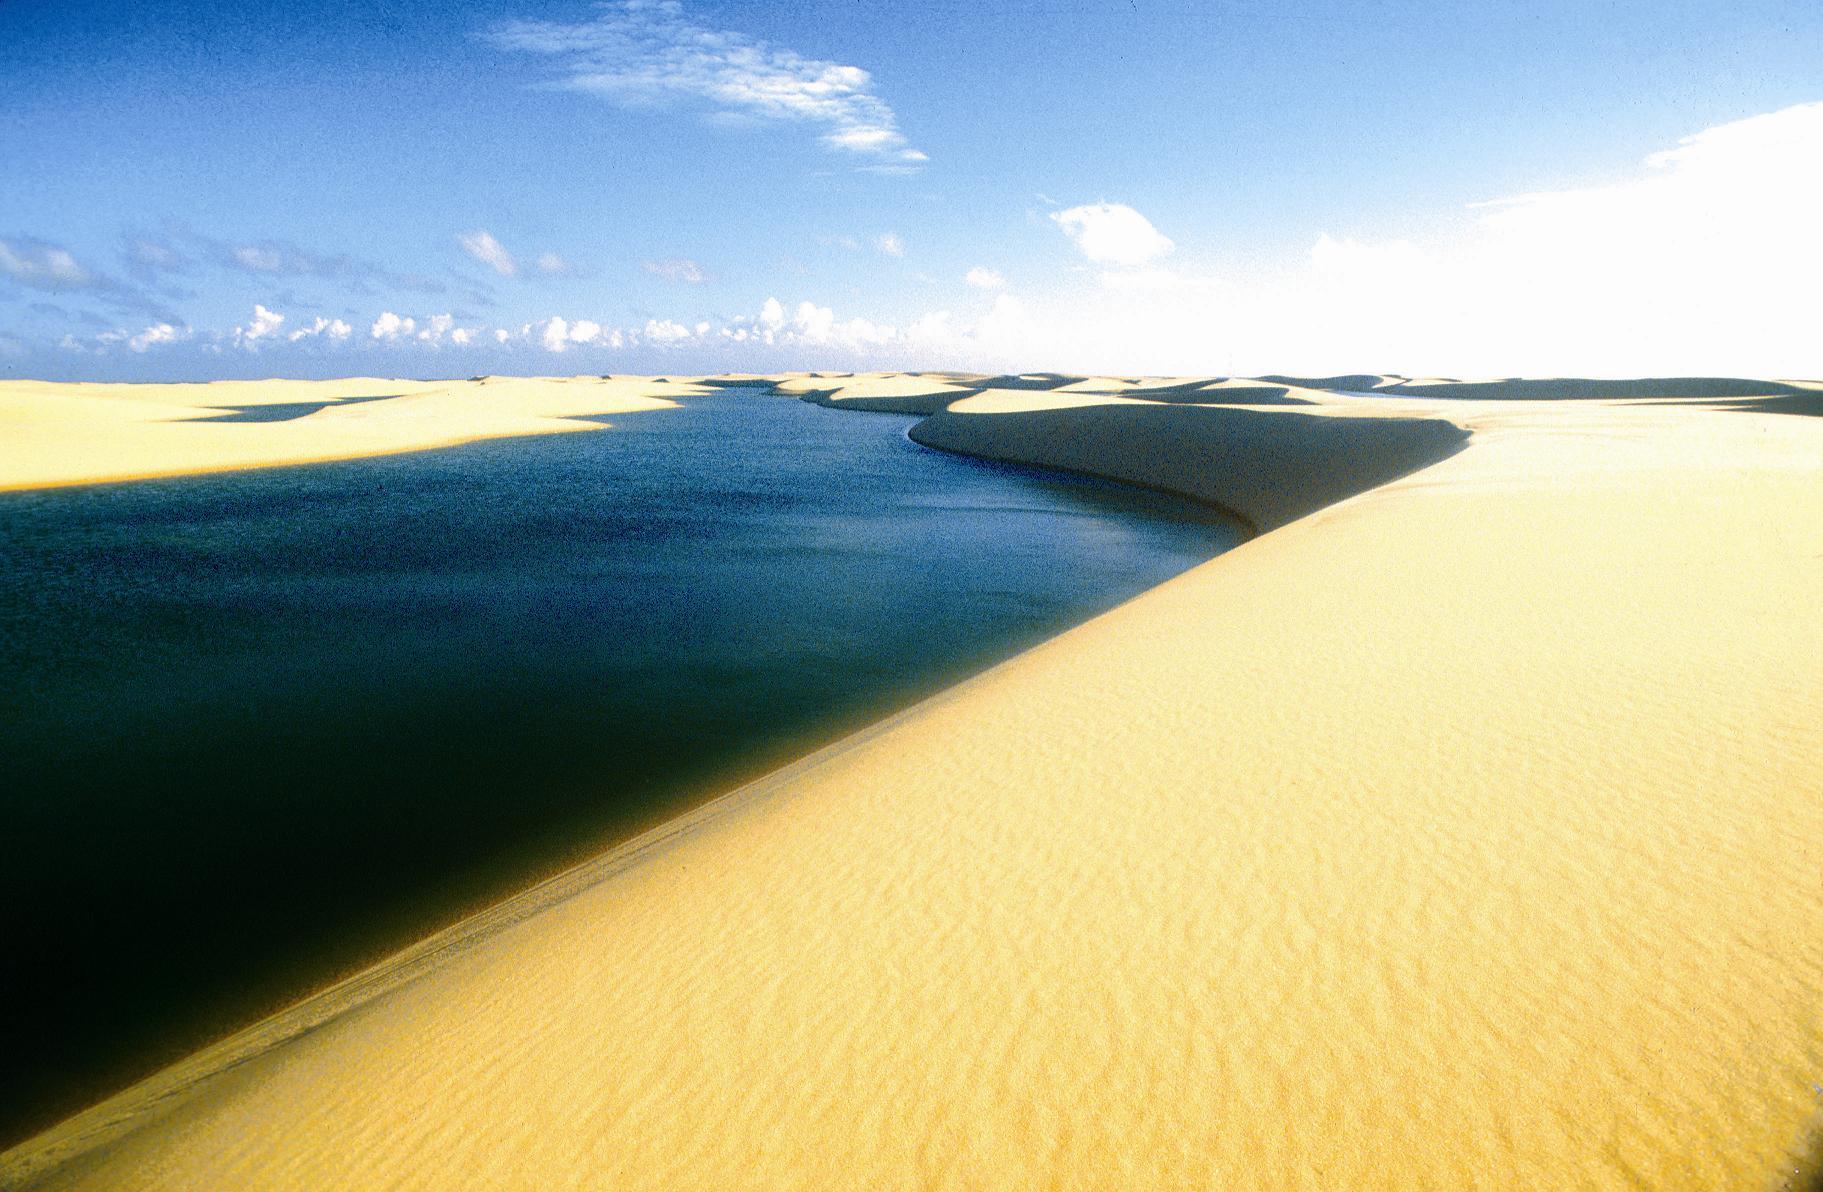 Encante-se com a natureza inexplorada do Delta do Parnaíba